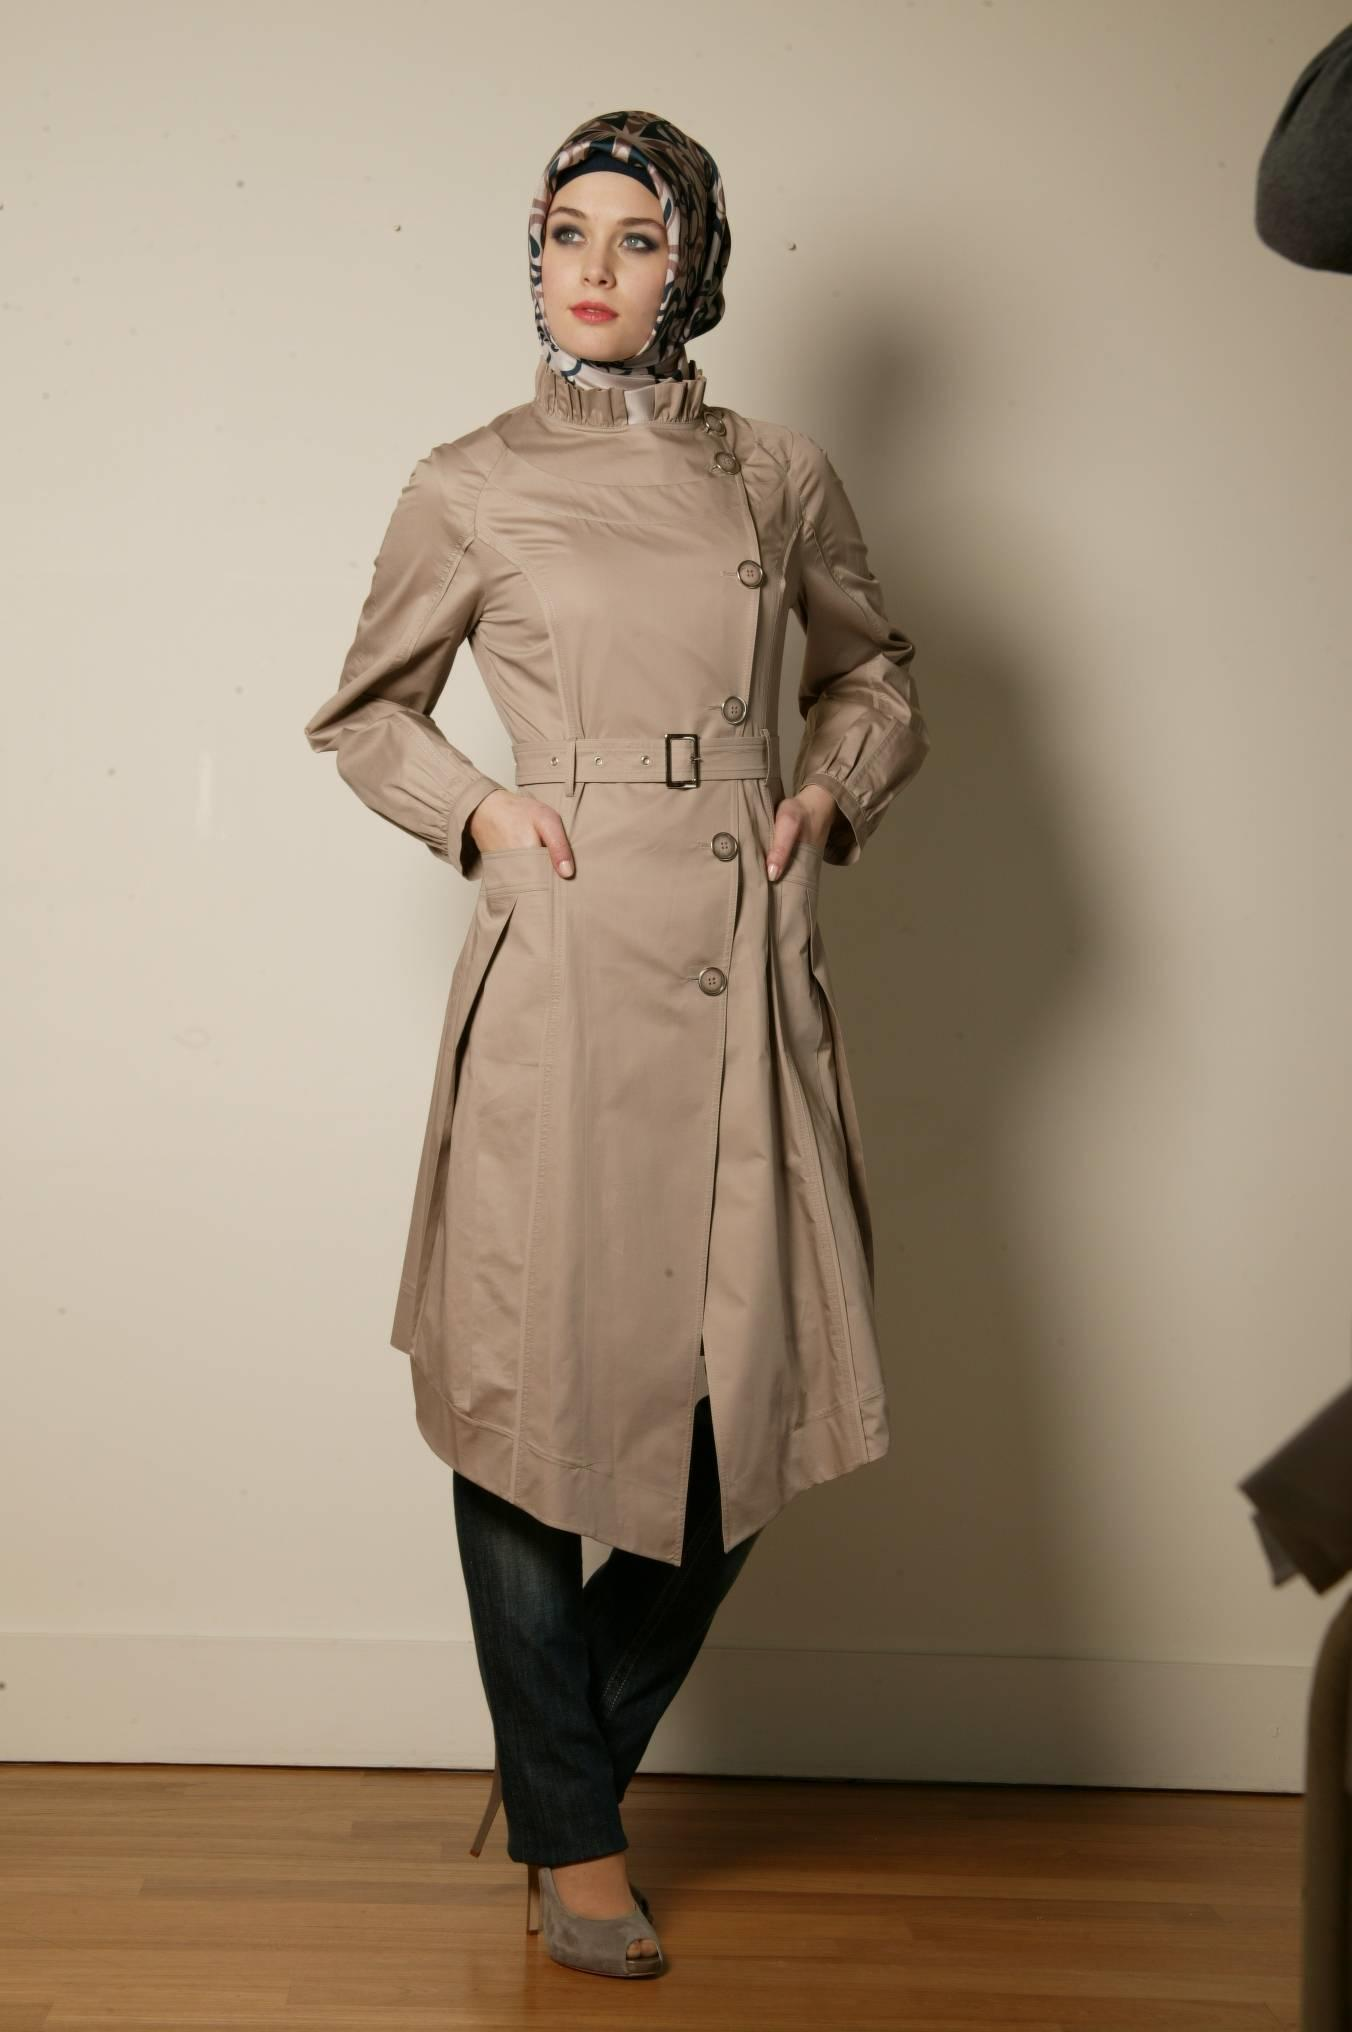 مدل مانتو بیرون (حجاب کامل)